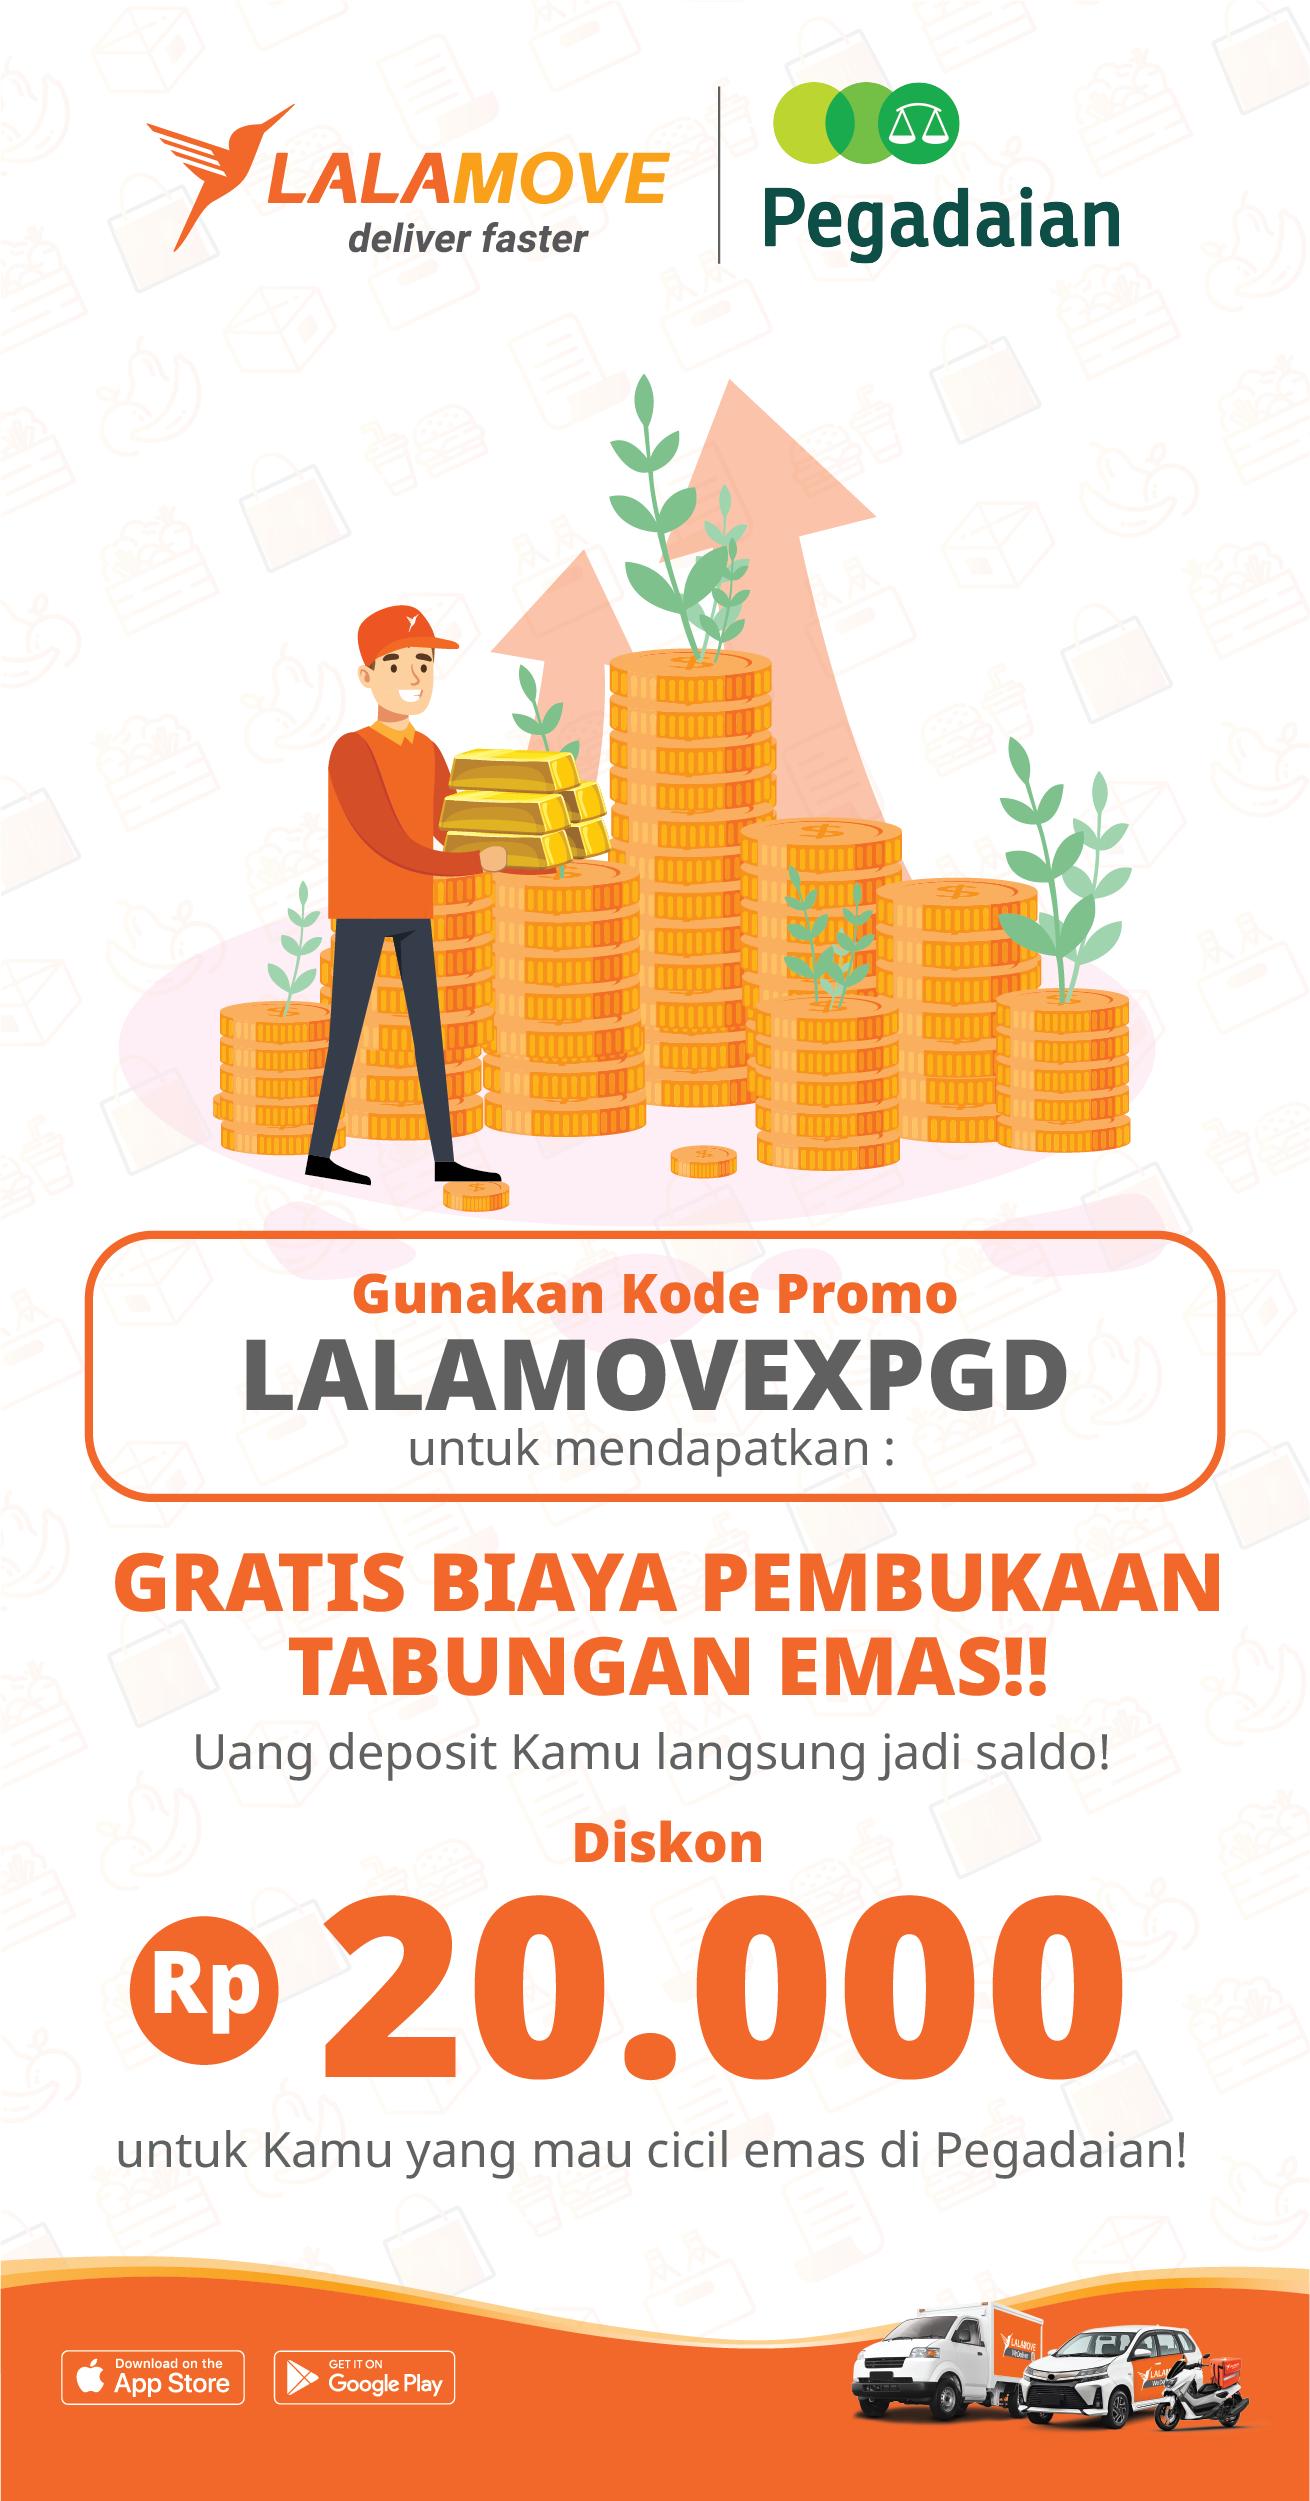 llm_pegadaian-update1 (2)